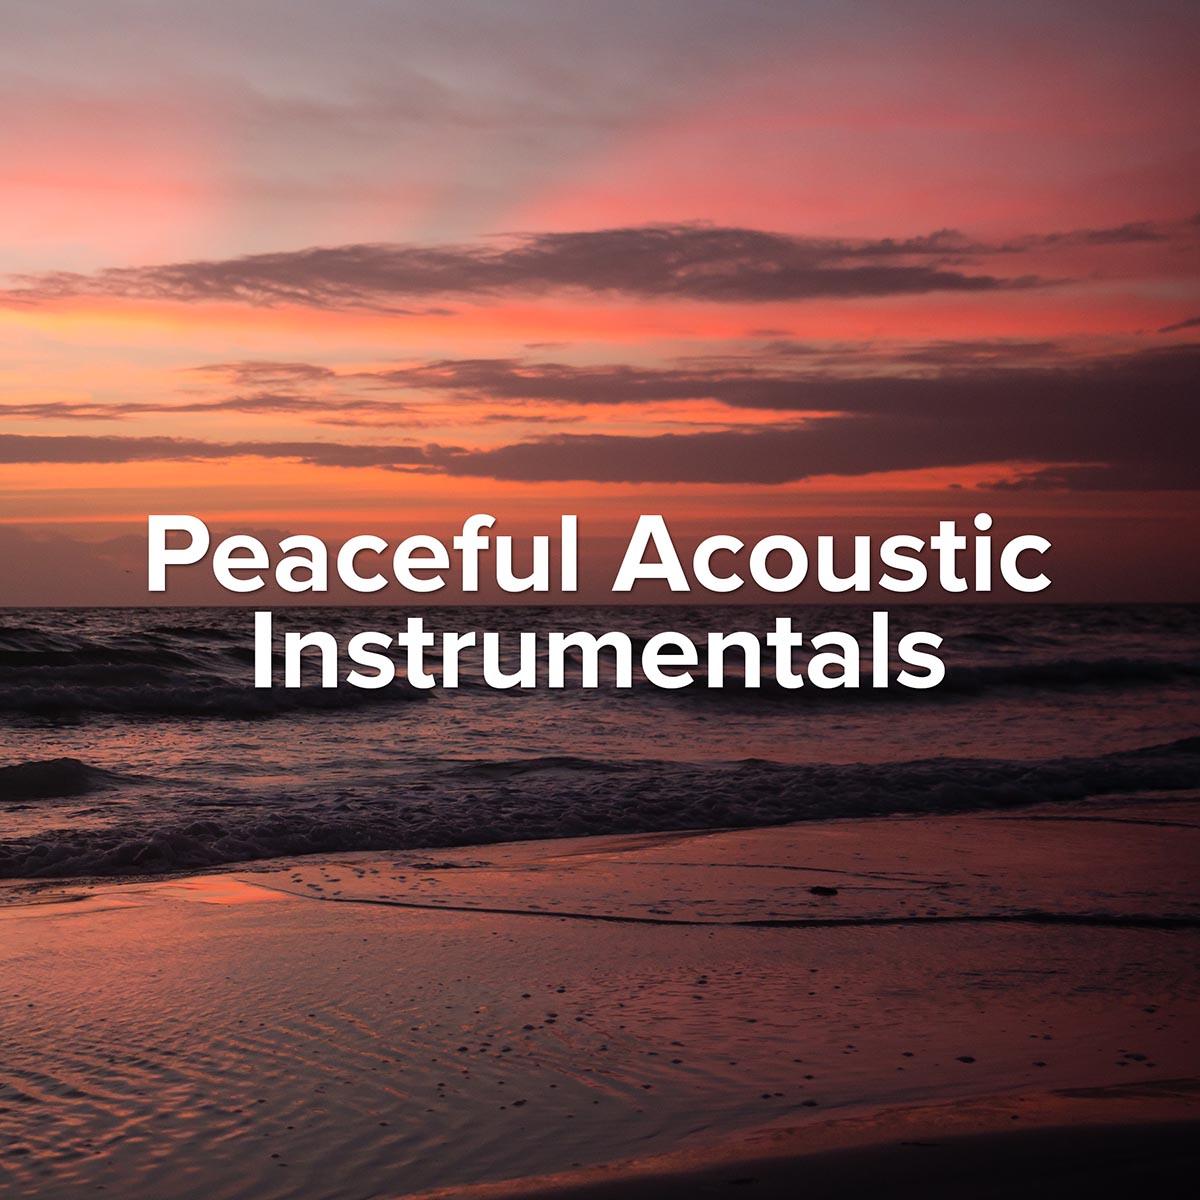 Peaceful Acoustic Instrumentals Playlist